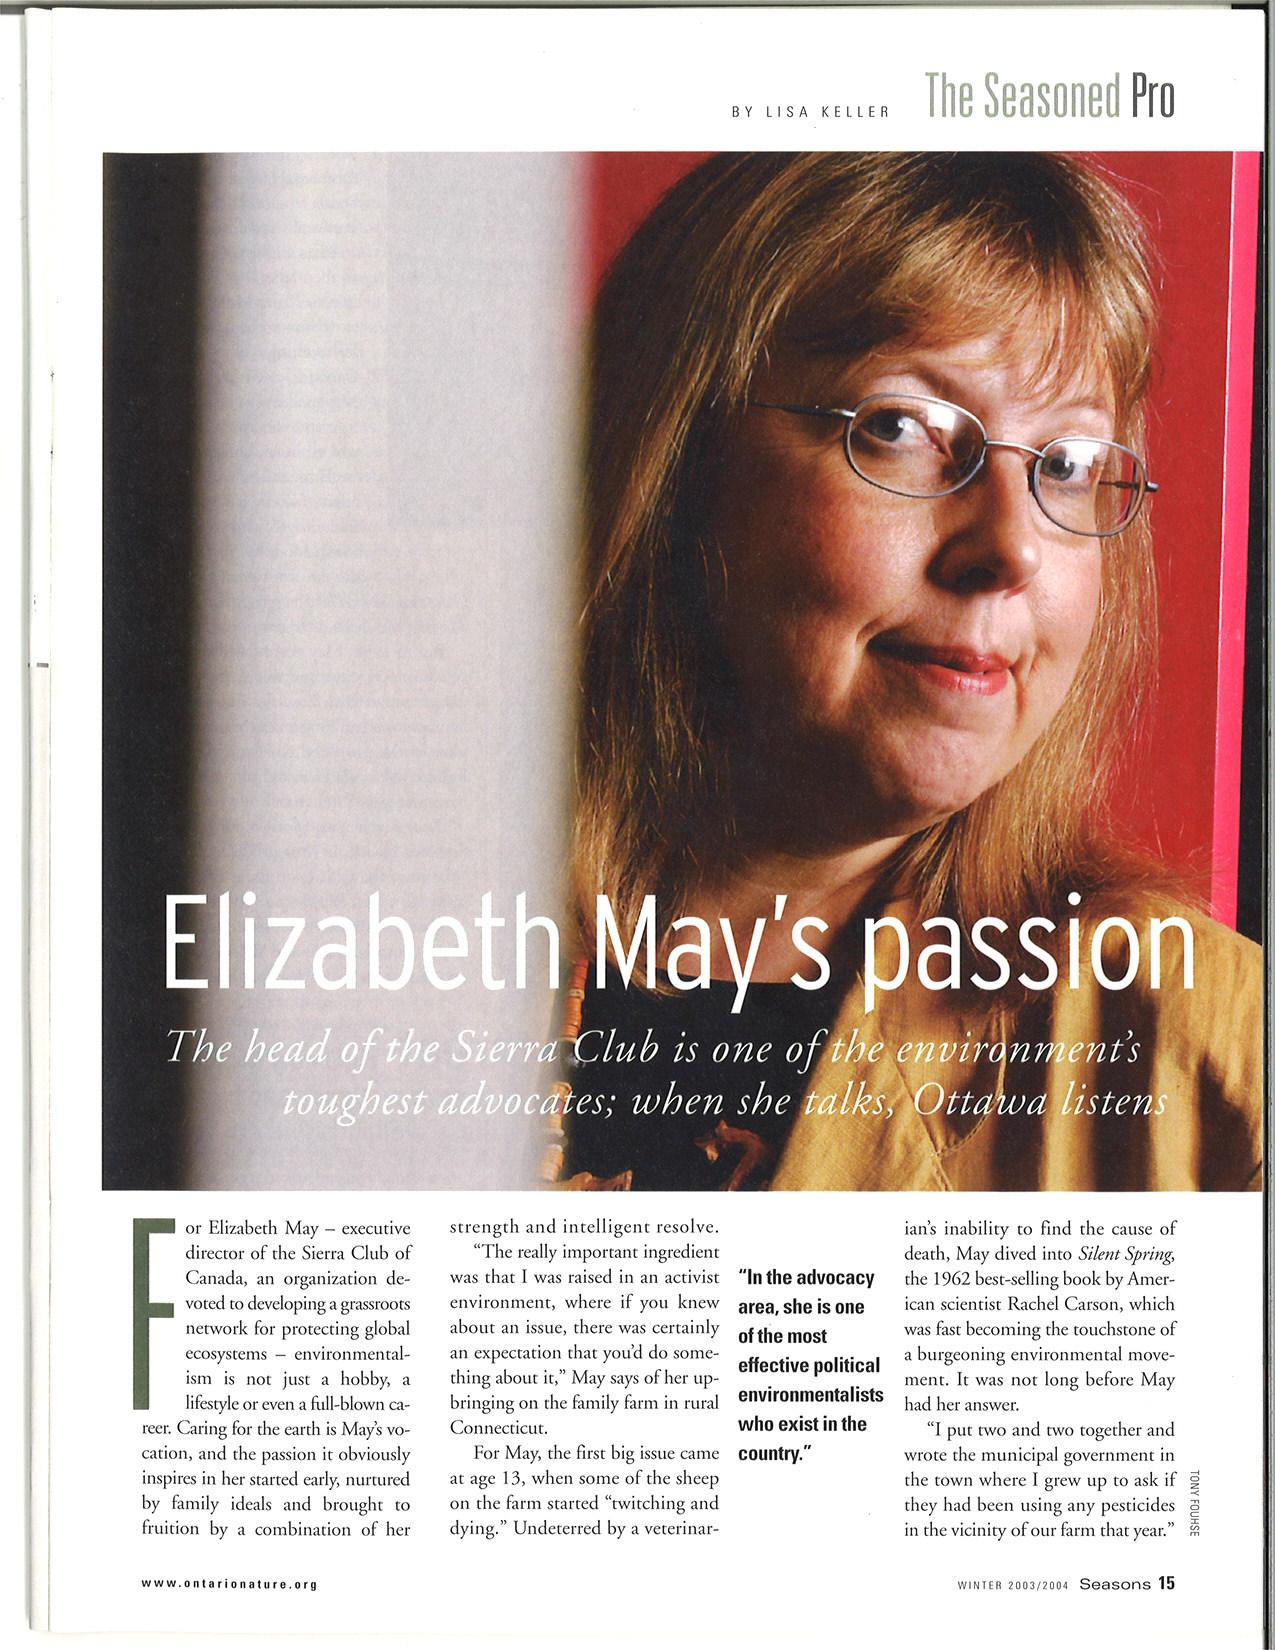 seasons_2003_v43_i4_d_the_seasoned_Elizabeth_mays_passion_15